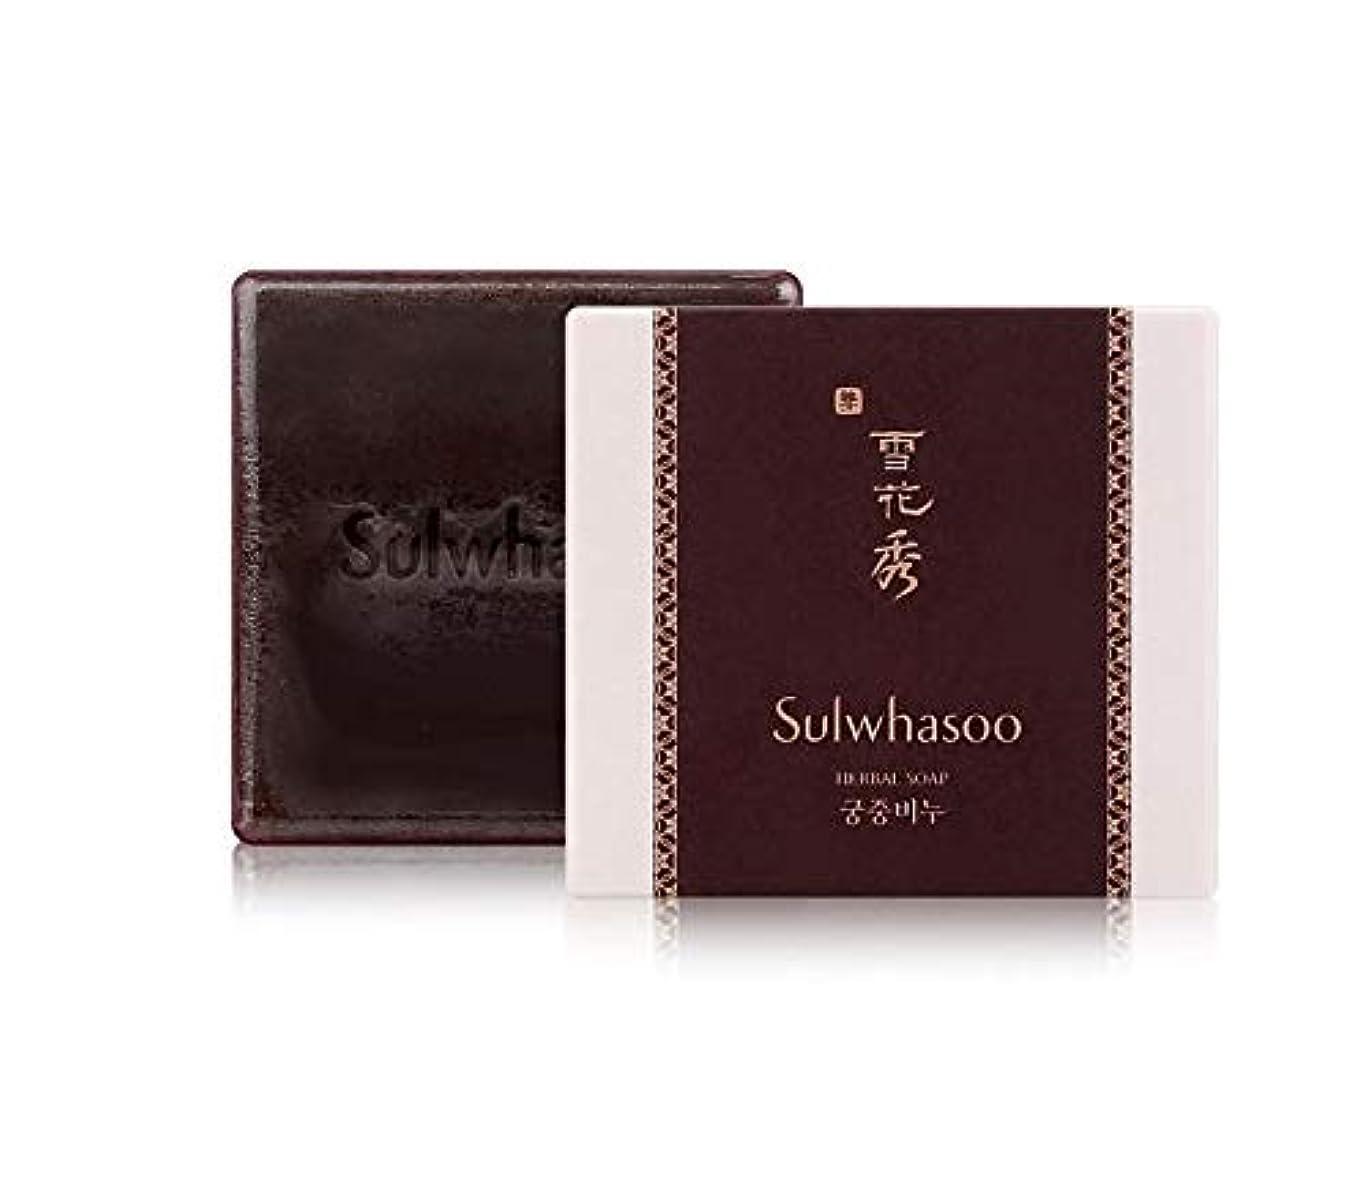 [雪花秀] SULWHASOO HERBAL SOAP 宮中石鹸 (韩国正品)